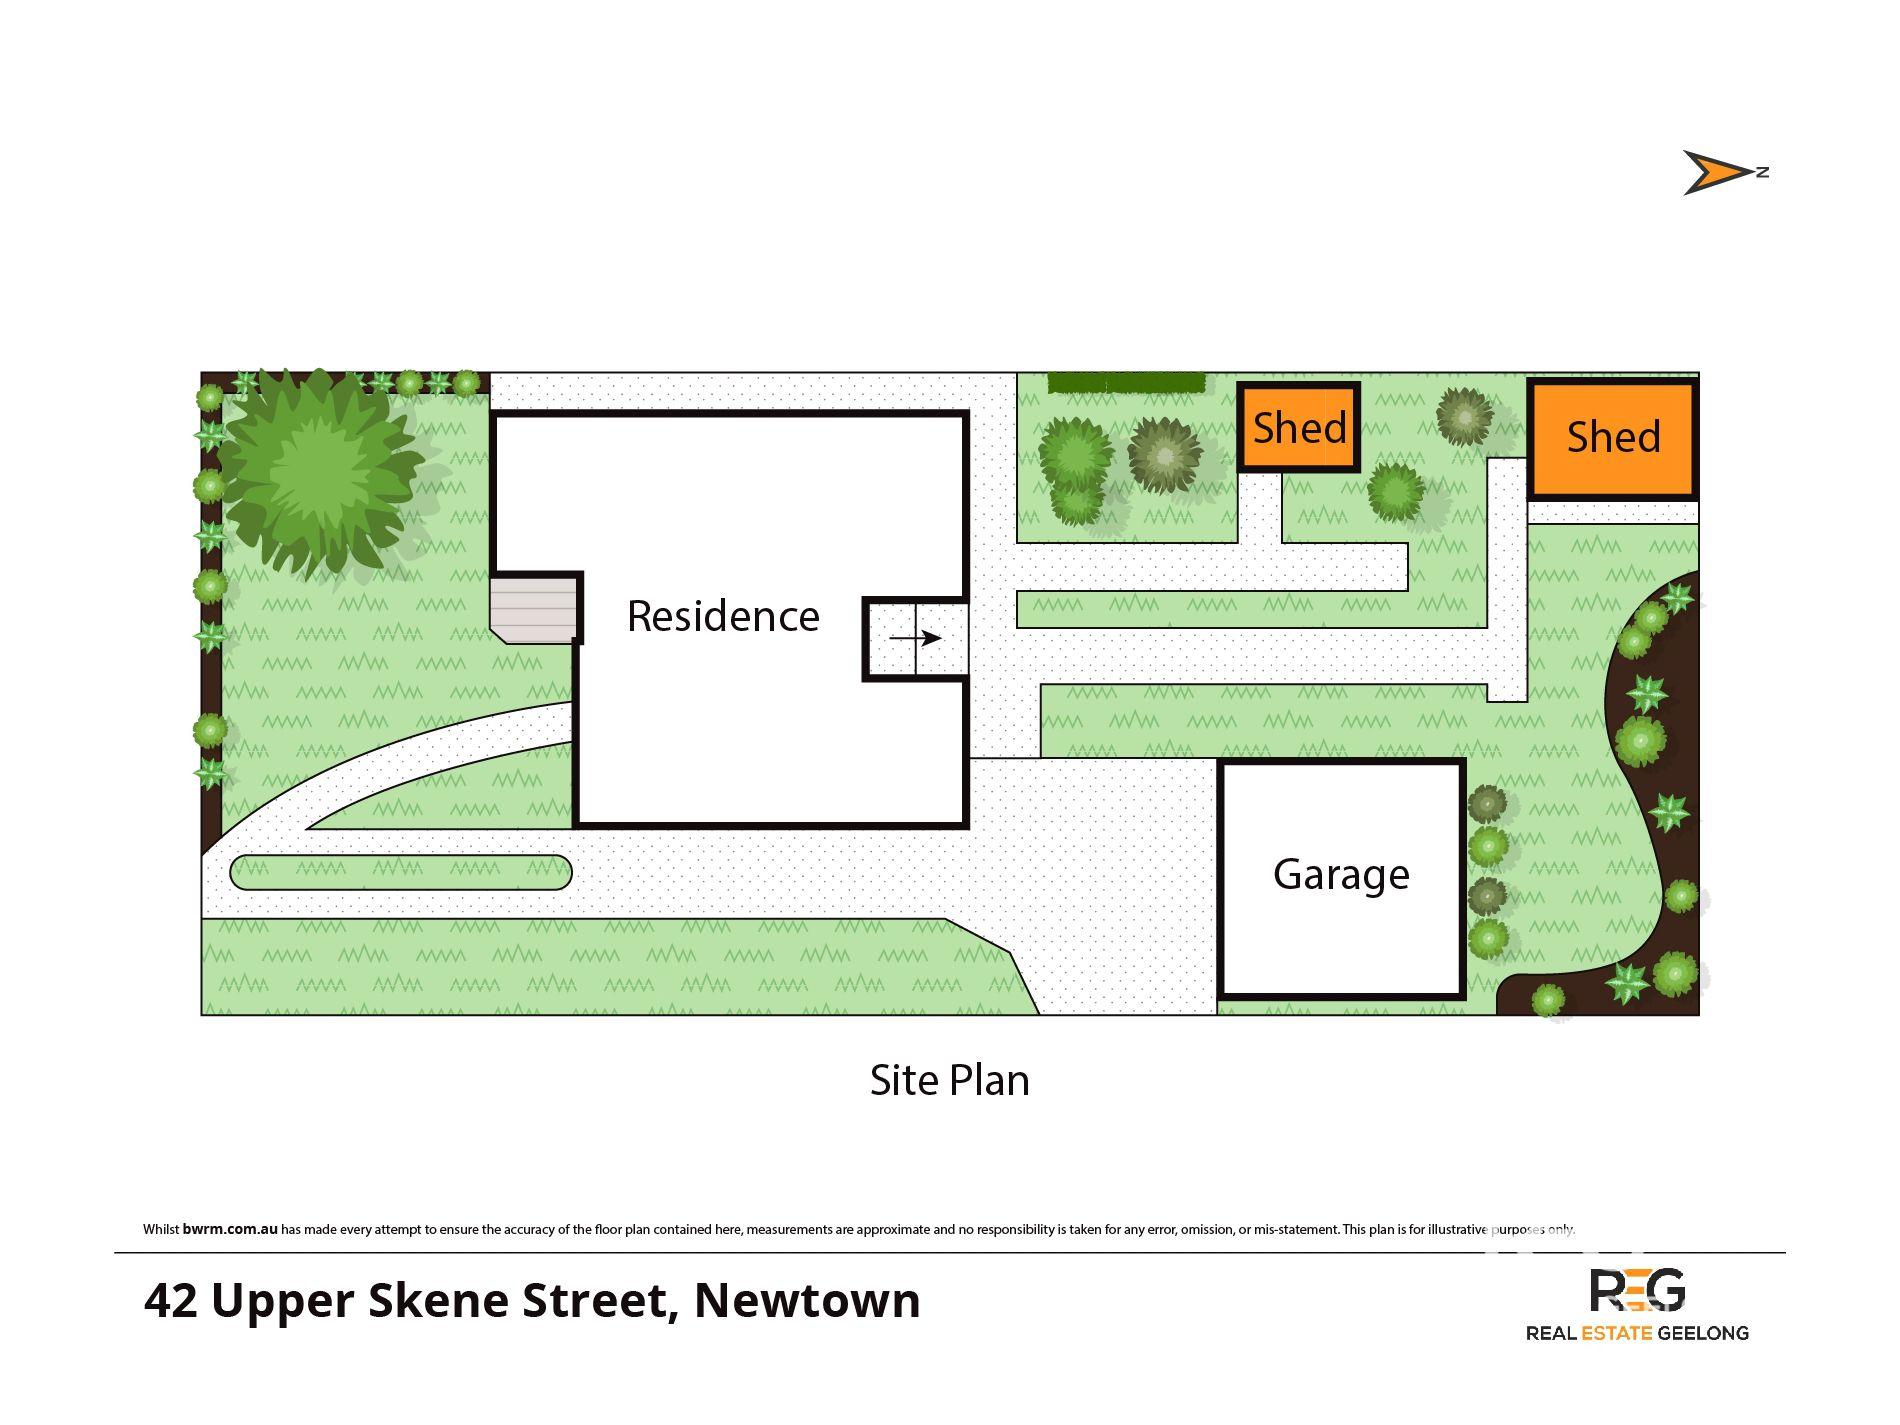 42 UPPER SKENE STREET, Newtown